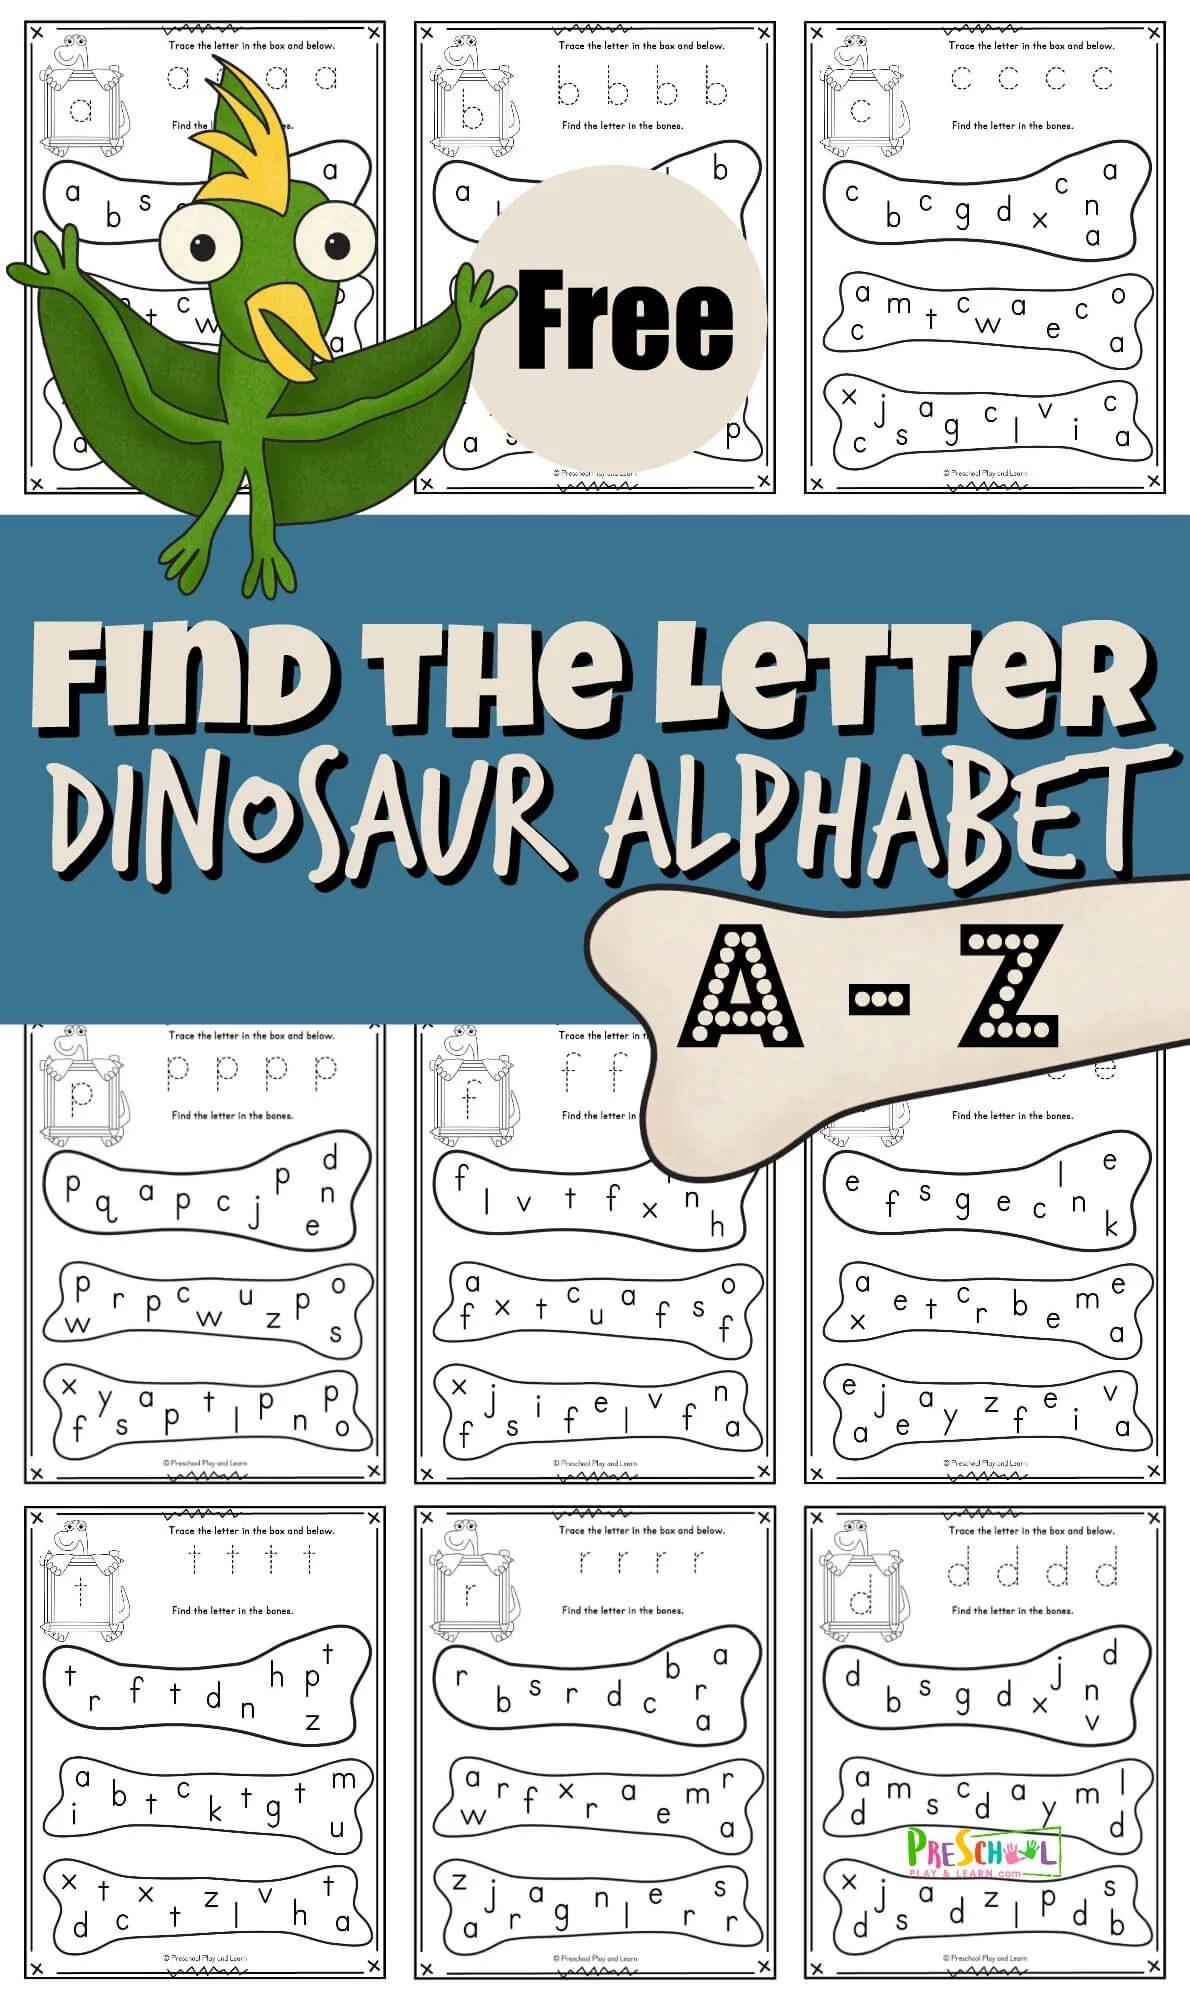 hight resolution of FREE Find the Letter Dinosaur Alphabet Fun